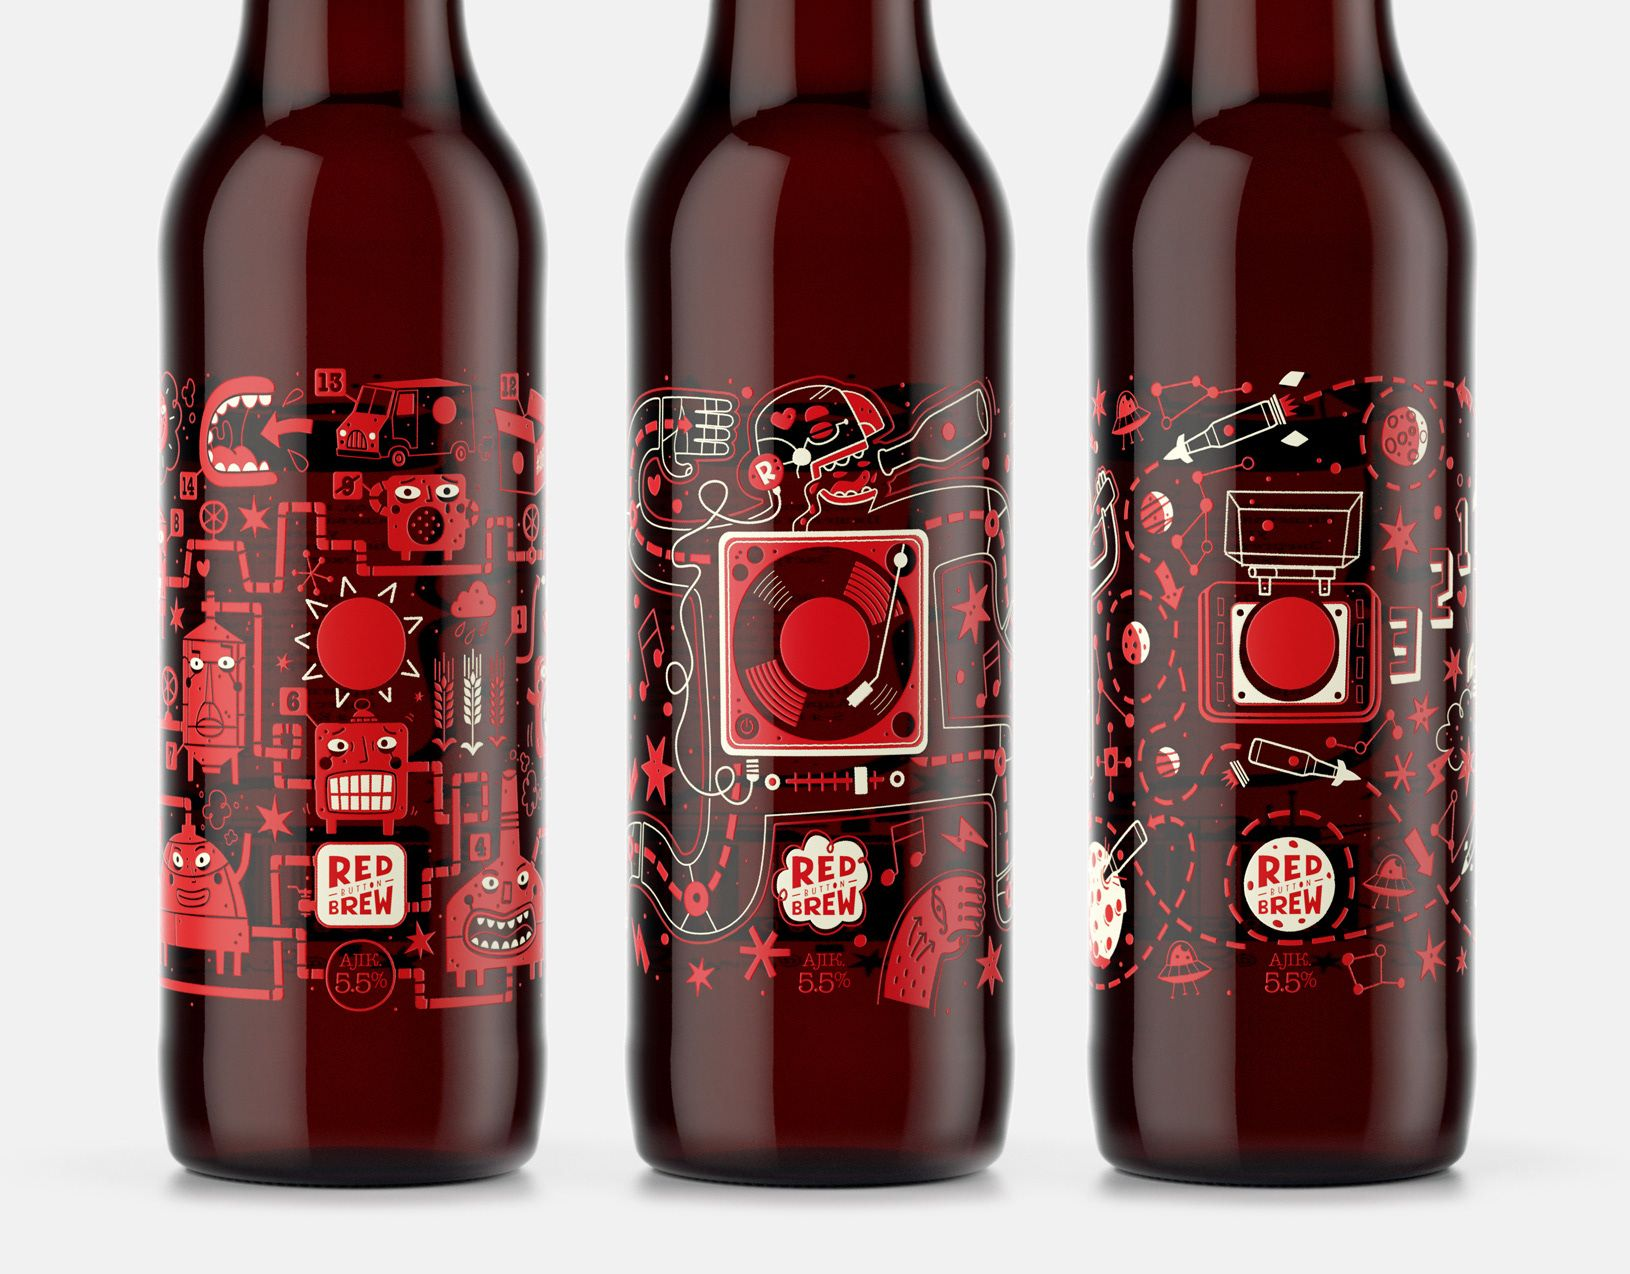 Illustrated Beer Bottle Labels Using Thermocromic Inks For Red Button Brew Beer Bottle Labels Beer Illustration Red Beer